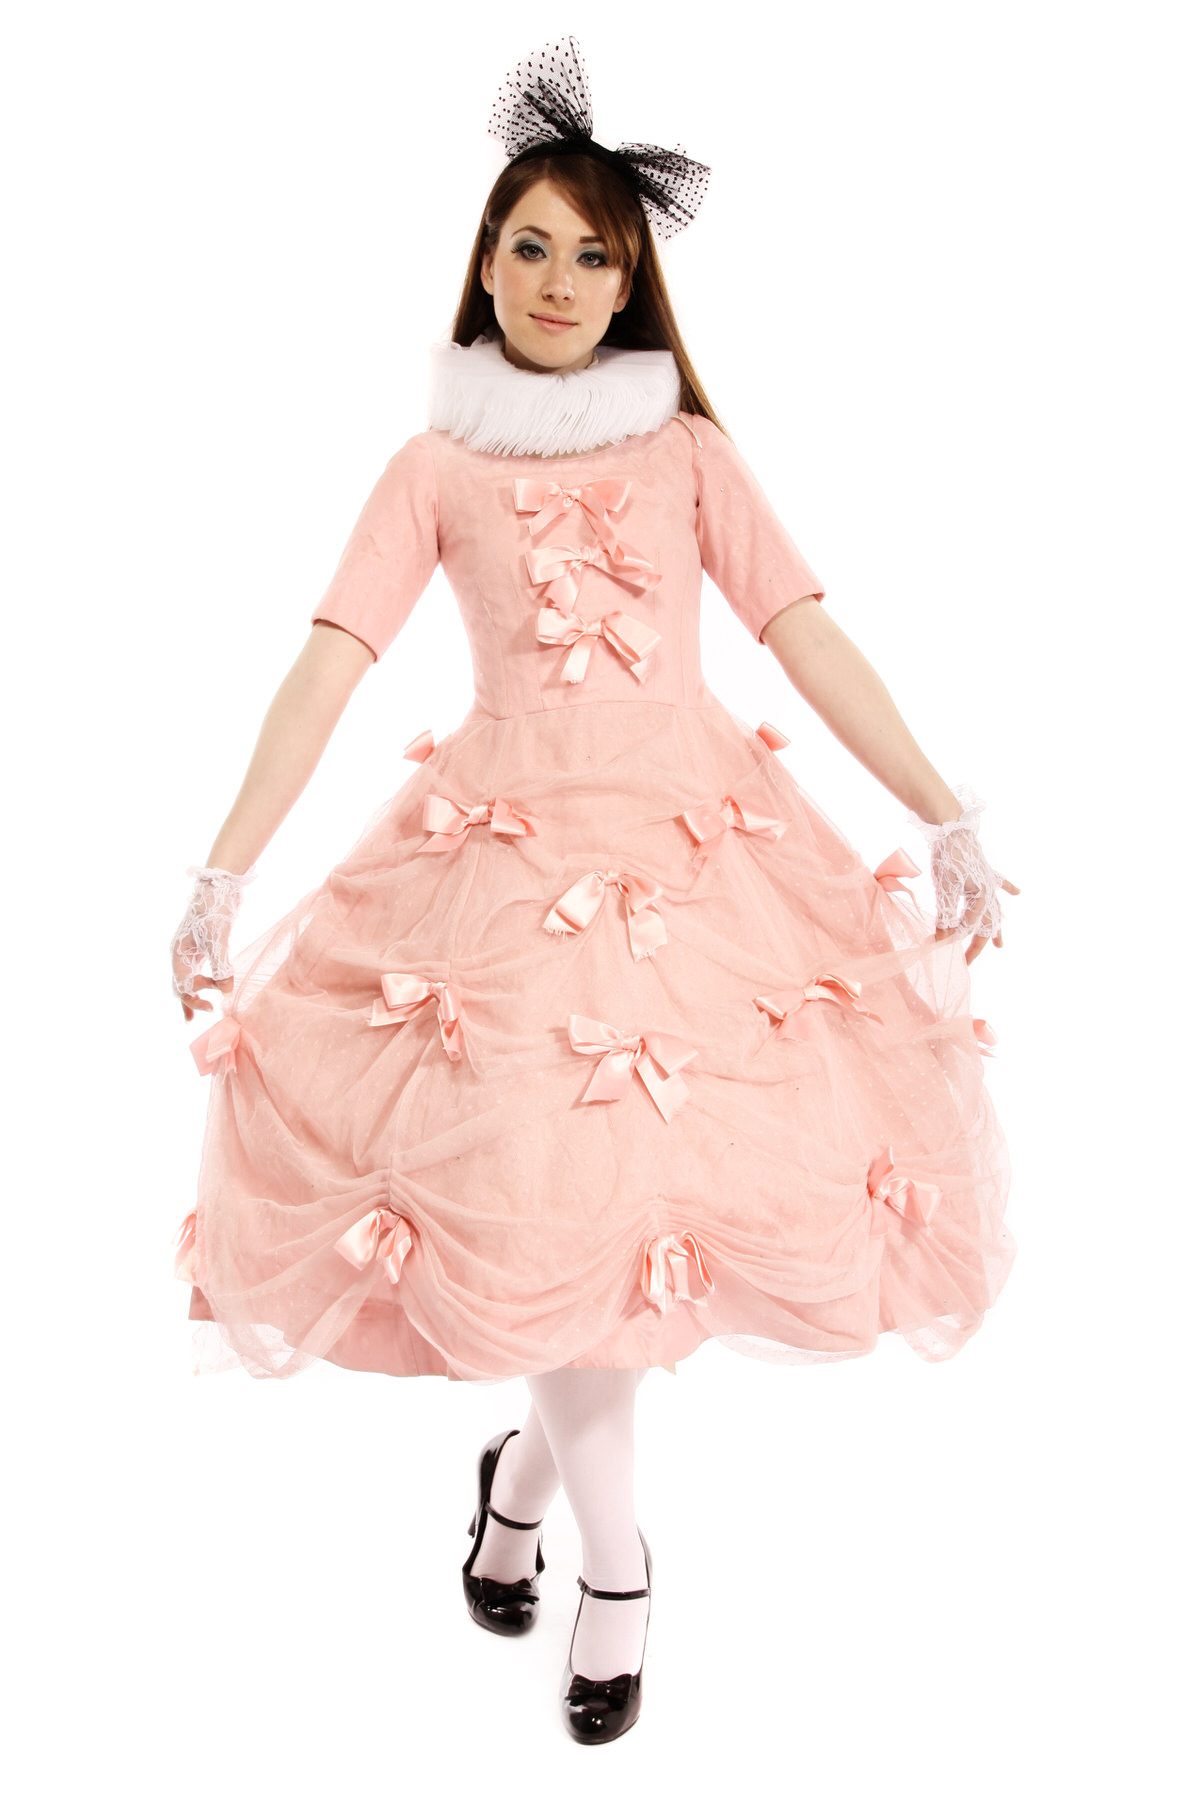 PINK ALICE COSTUME W WHITE NECK RUFF & BUNNY EARS